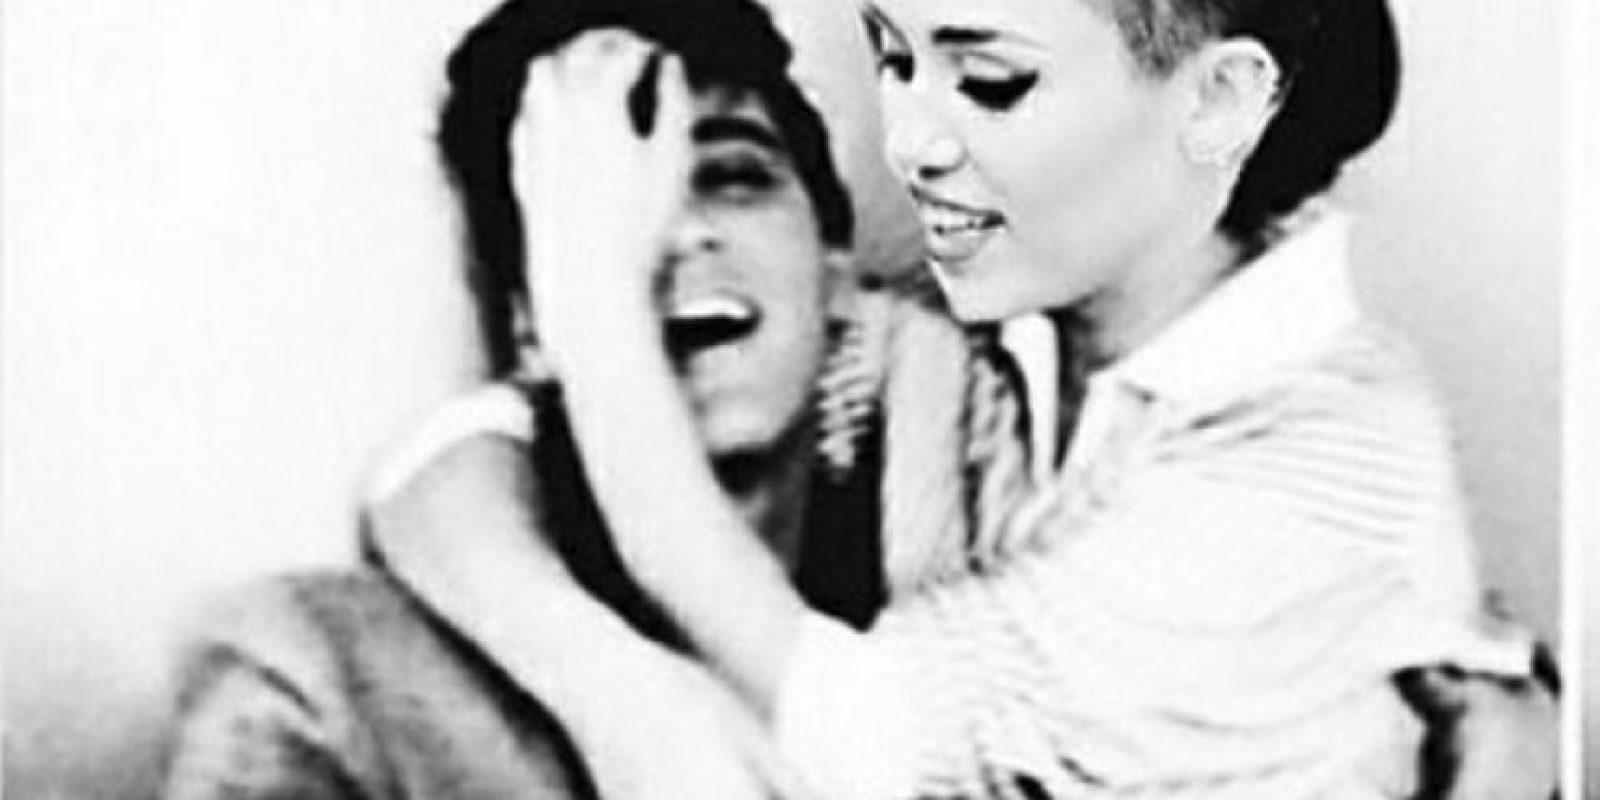 Foto:Instagram/Miley Cyrus